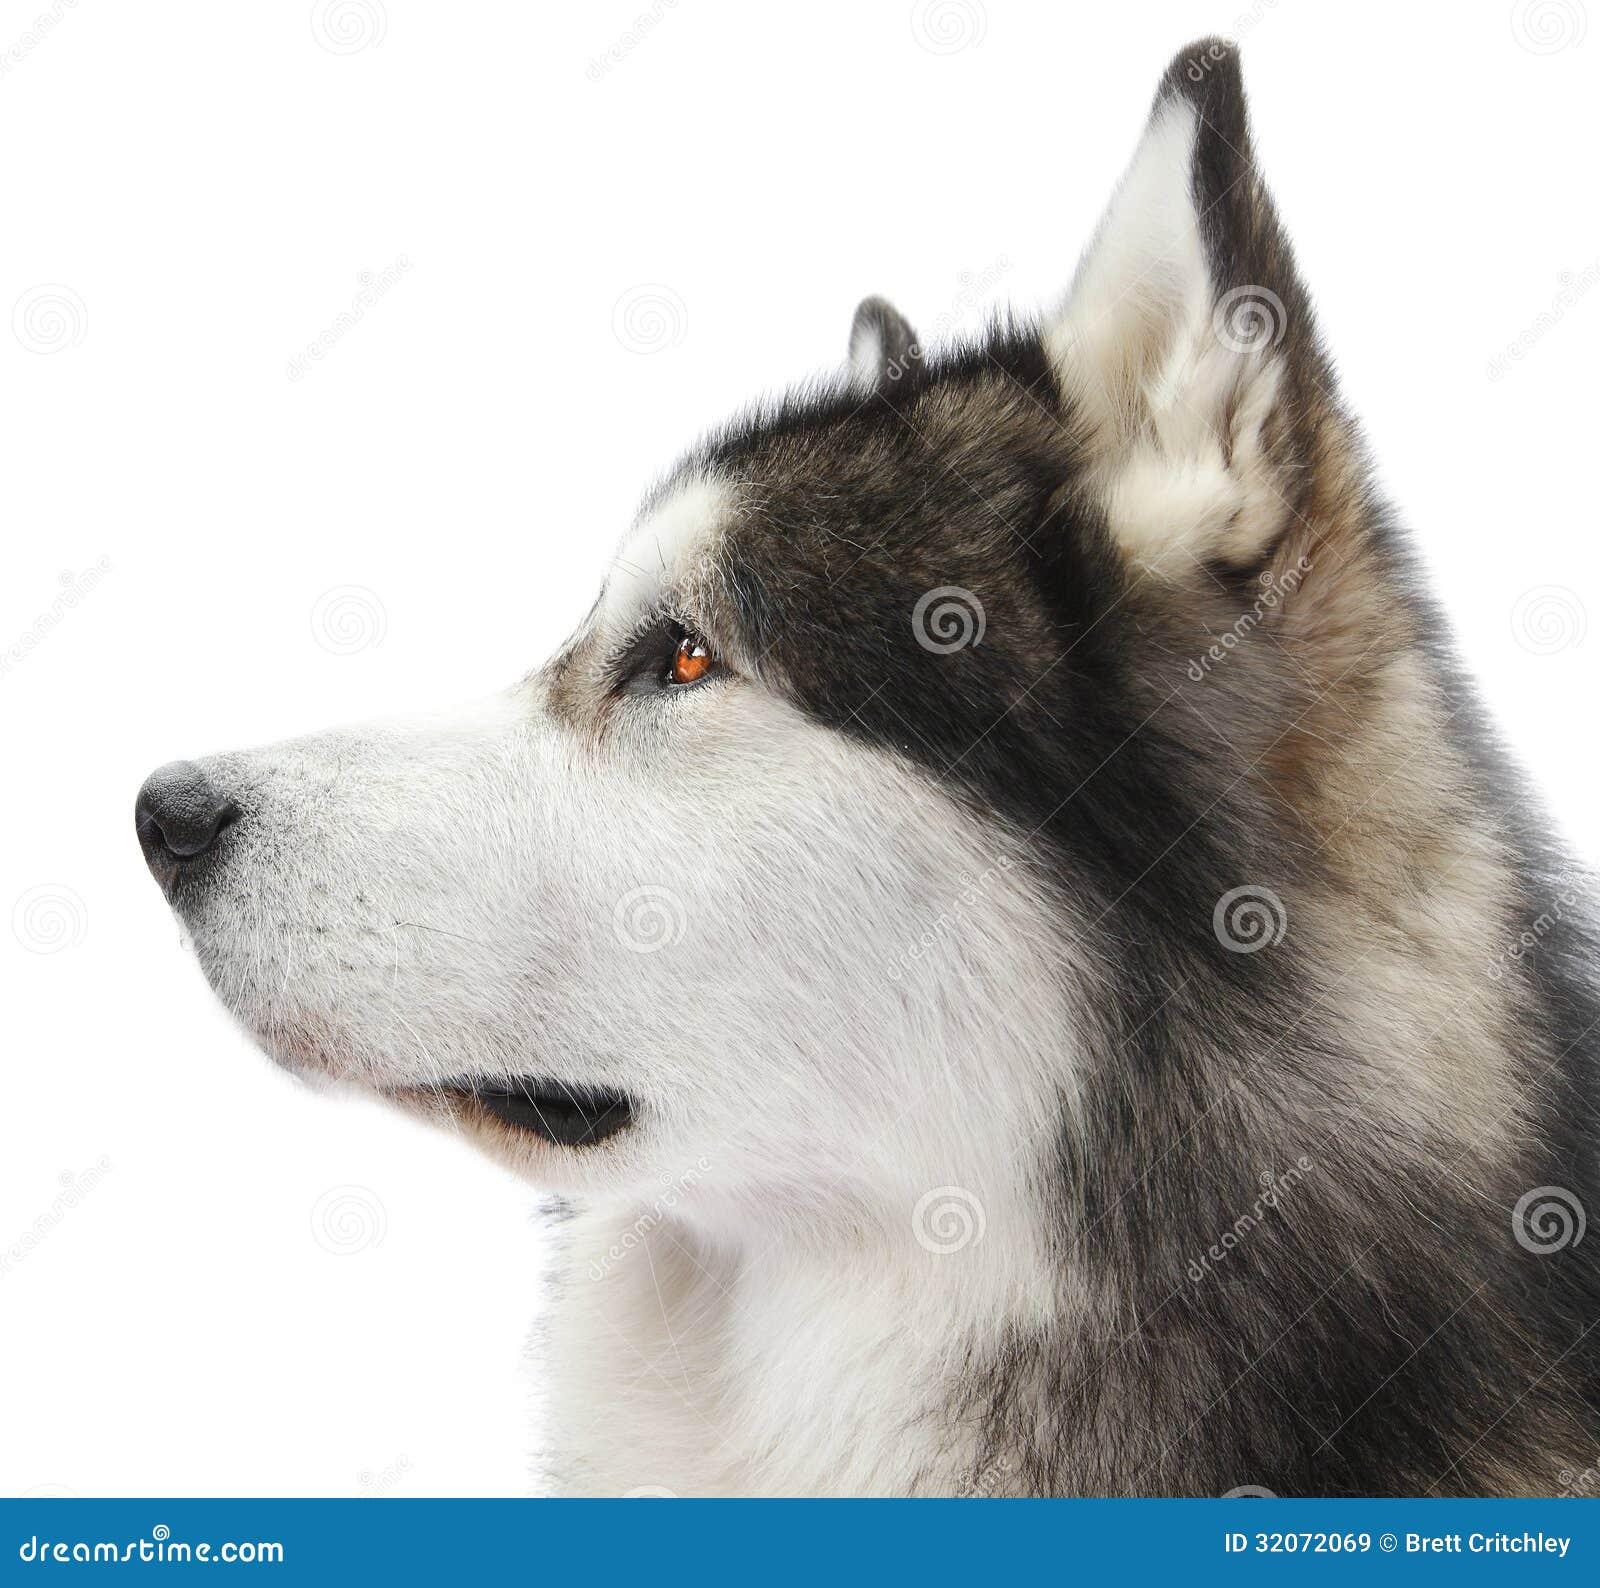 malamute dog portrait royalty free stock images image 32072069. Black Bedroom Furniture Sets. Home Design Ideas